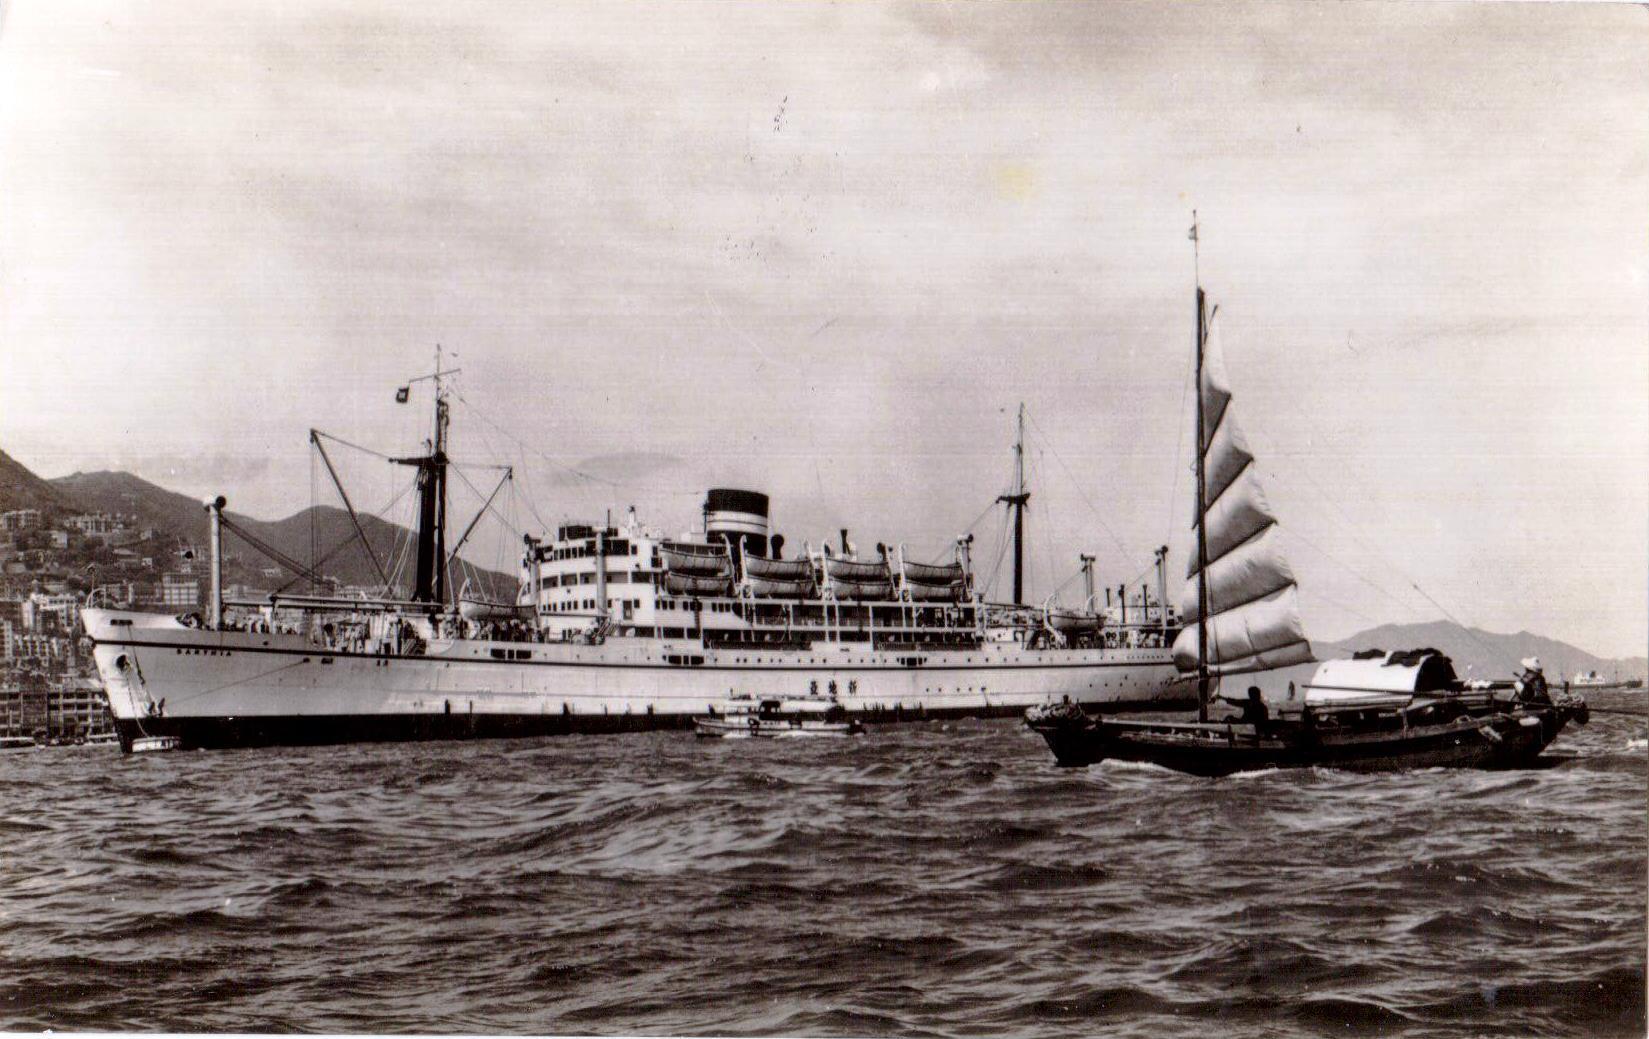 Image: Steamship